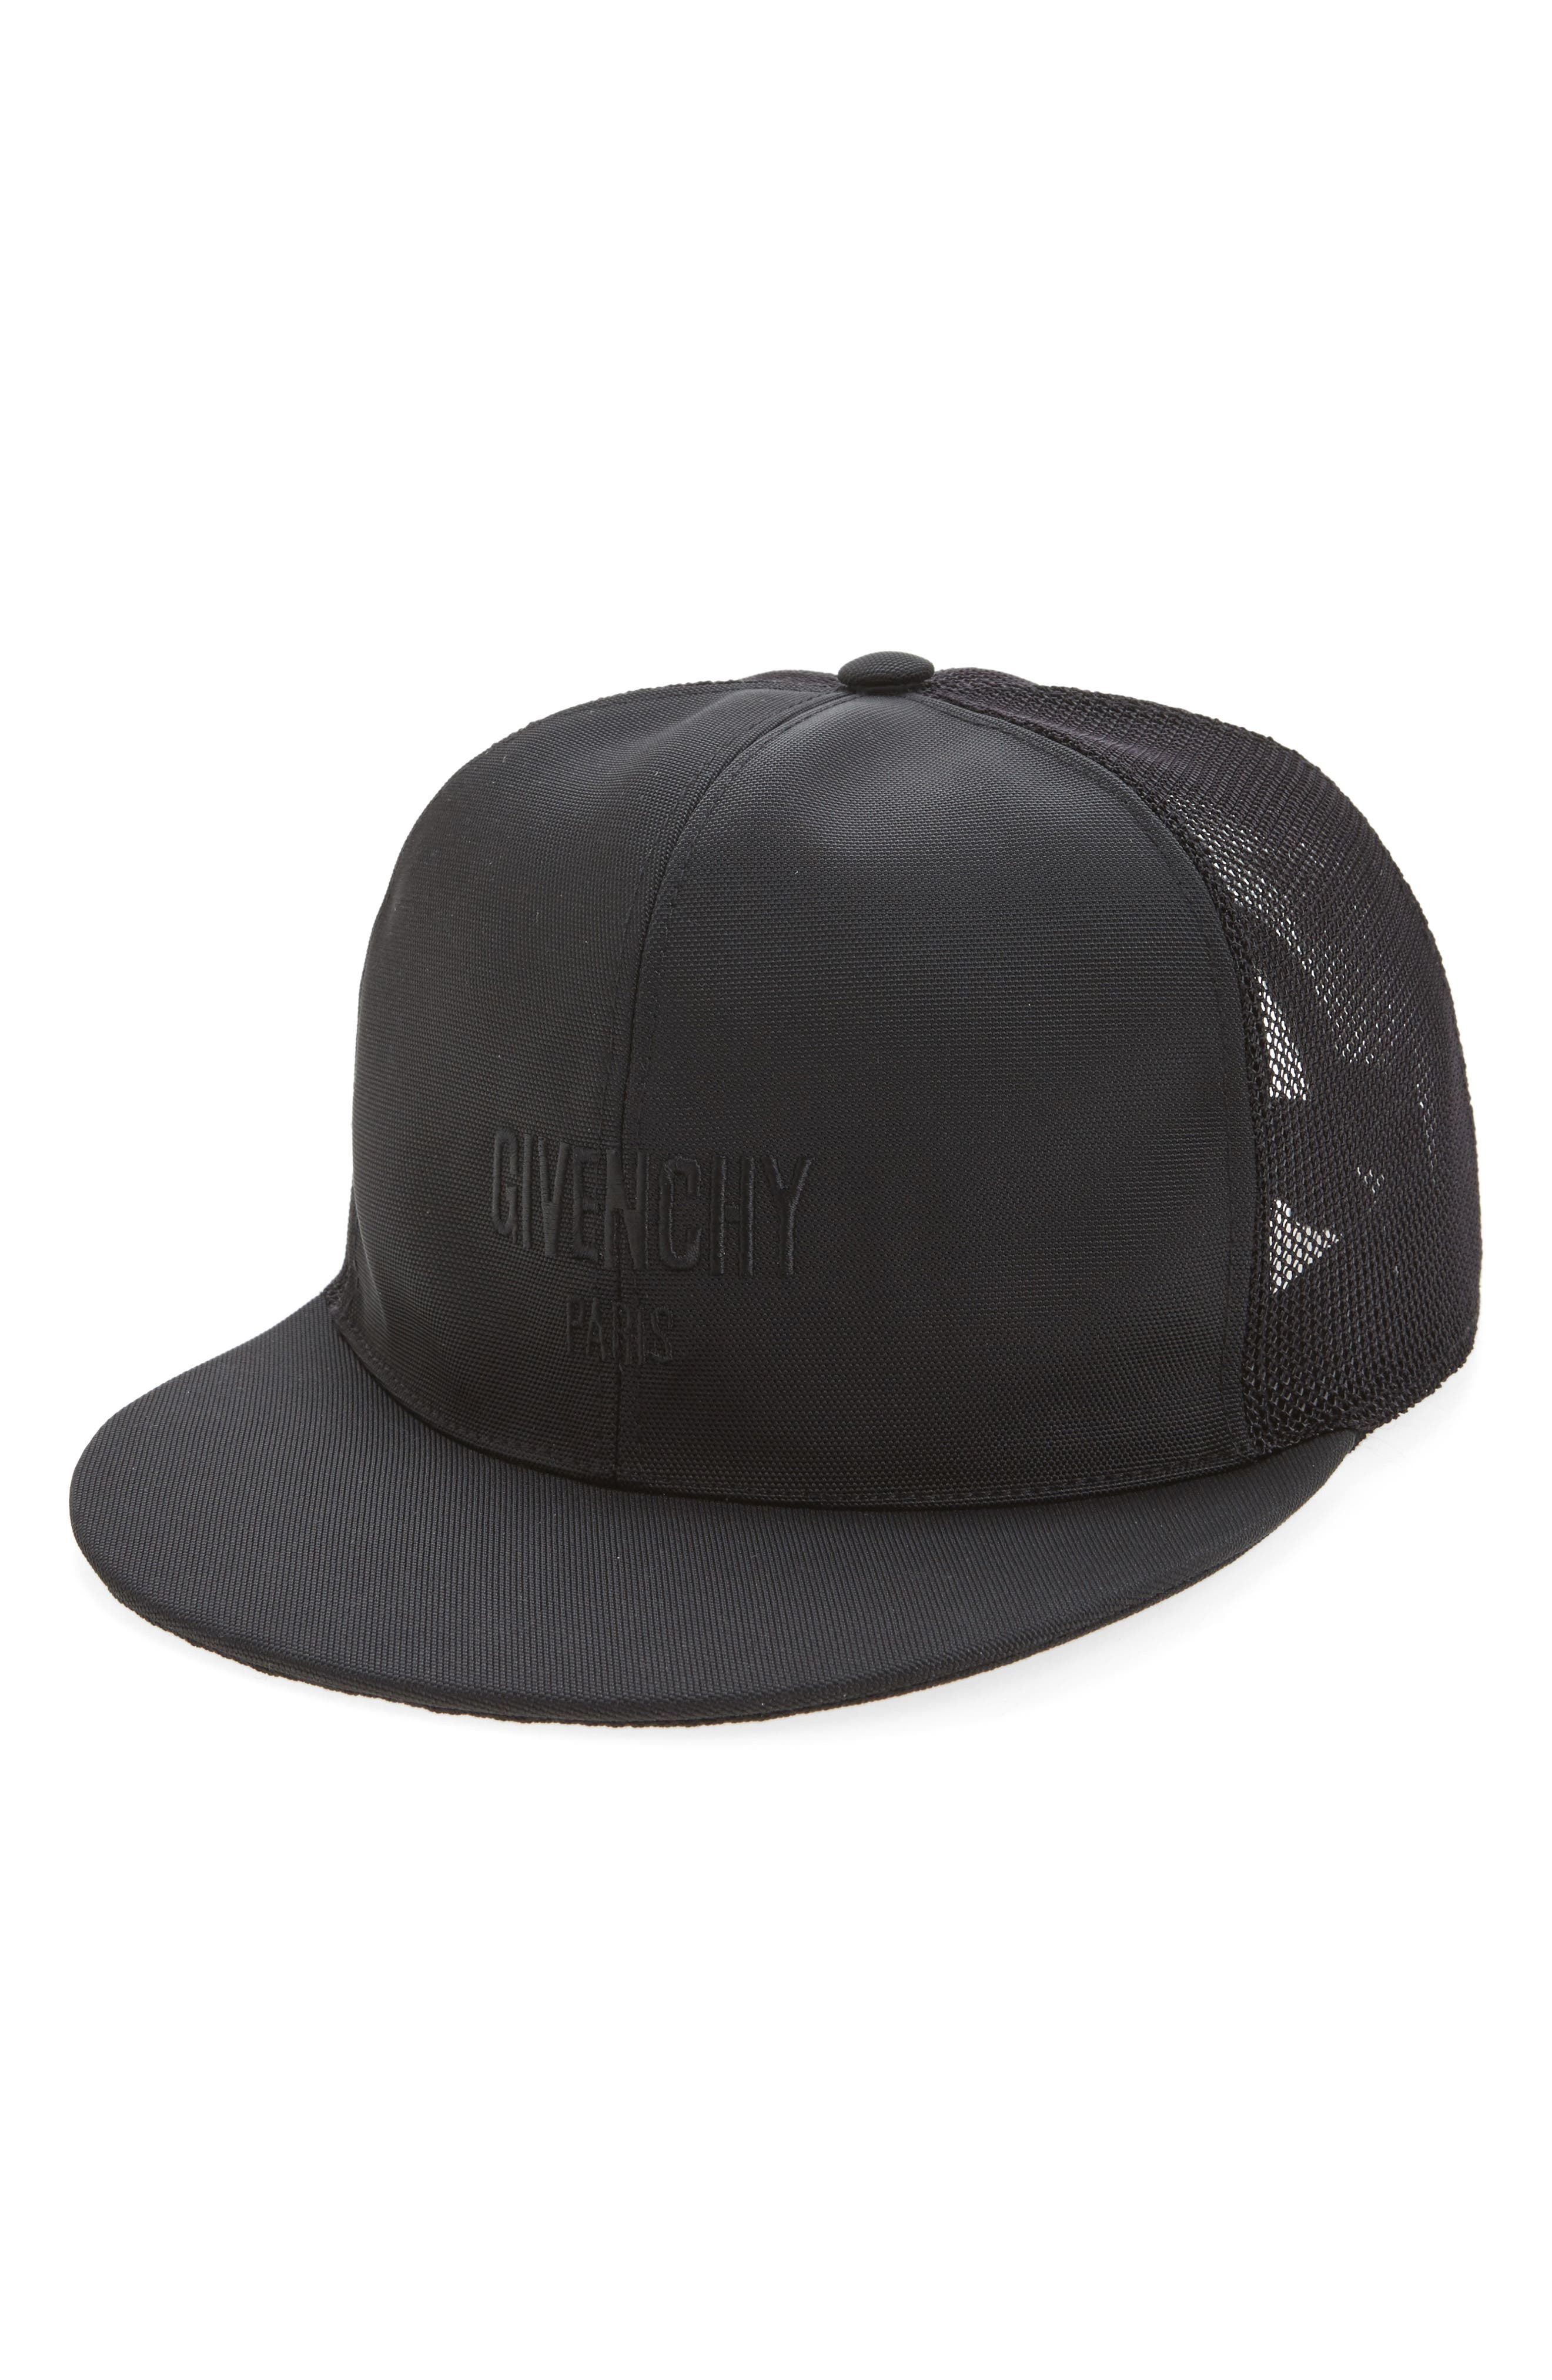 Stars Mesh & Canvas Baseball Cap,                         Main,                         color, Black